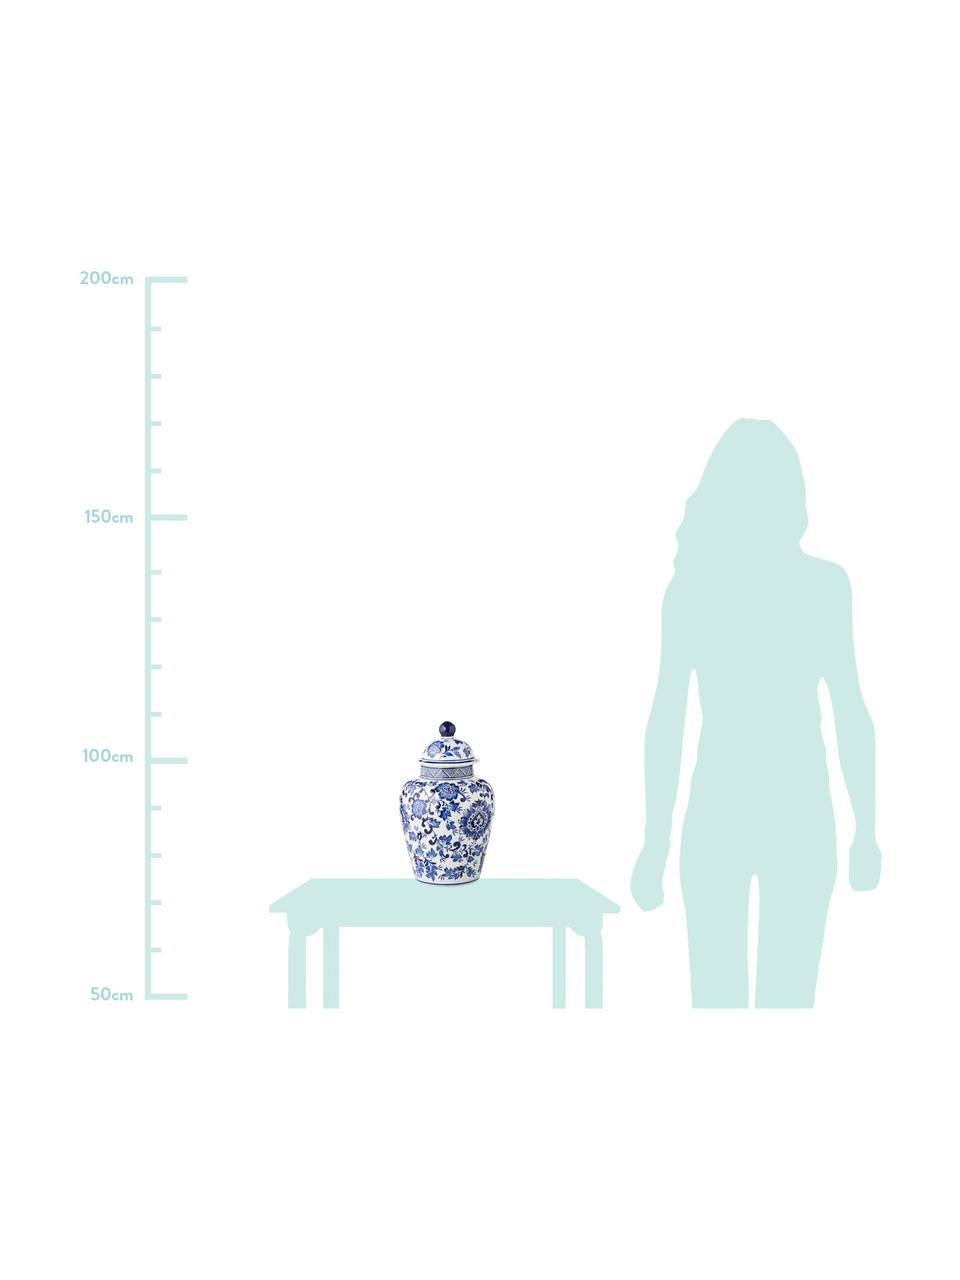 Vaso con coperchio in porcellana Annabelle, Porcellana, Blu, bianco, Ø 20 x Alt. 35 cm